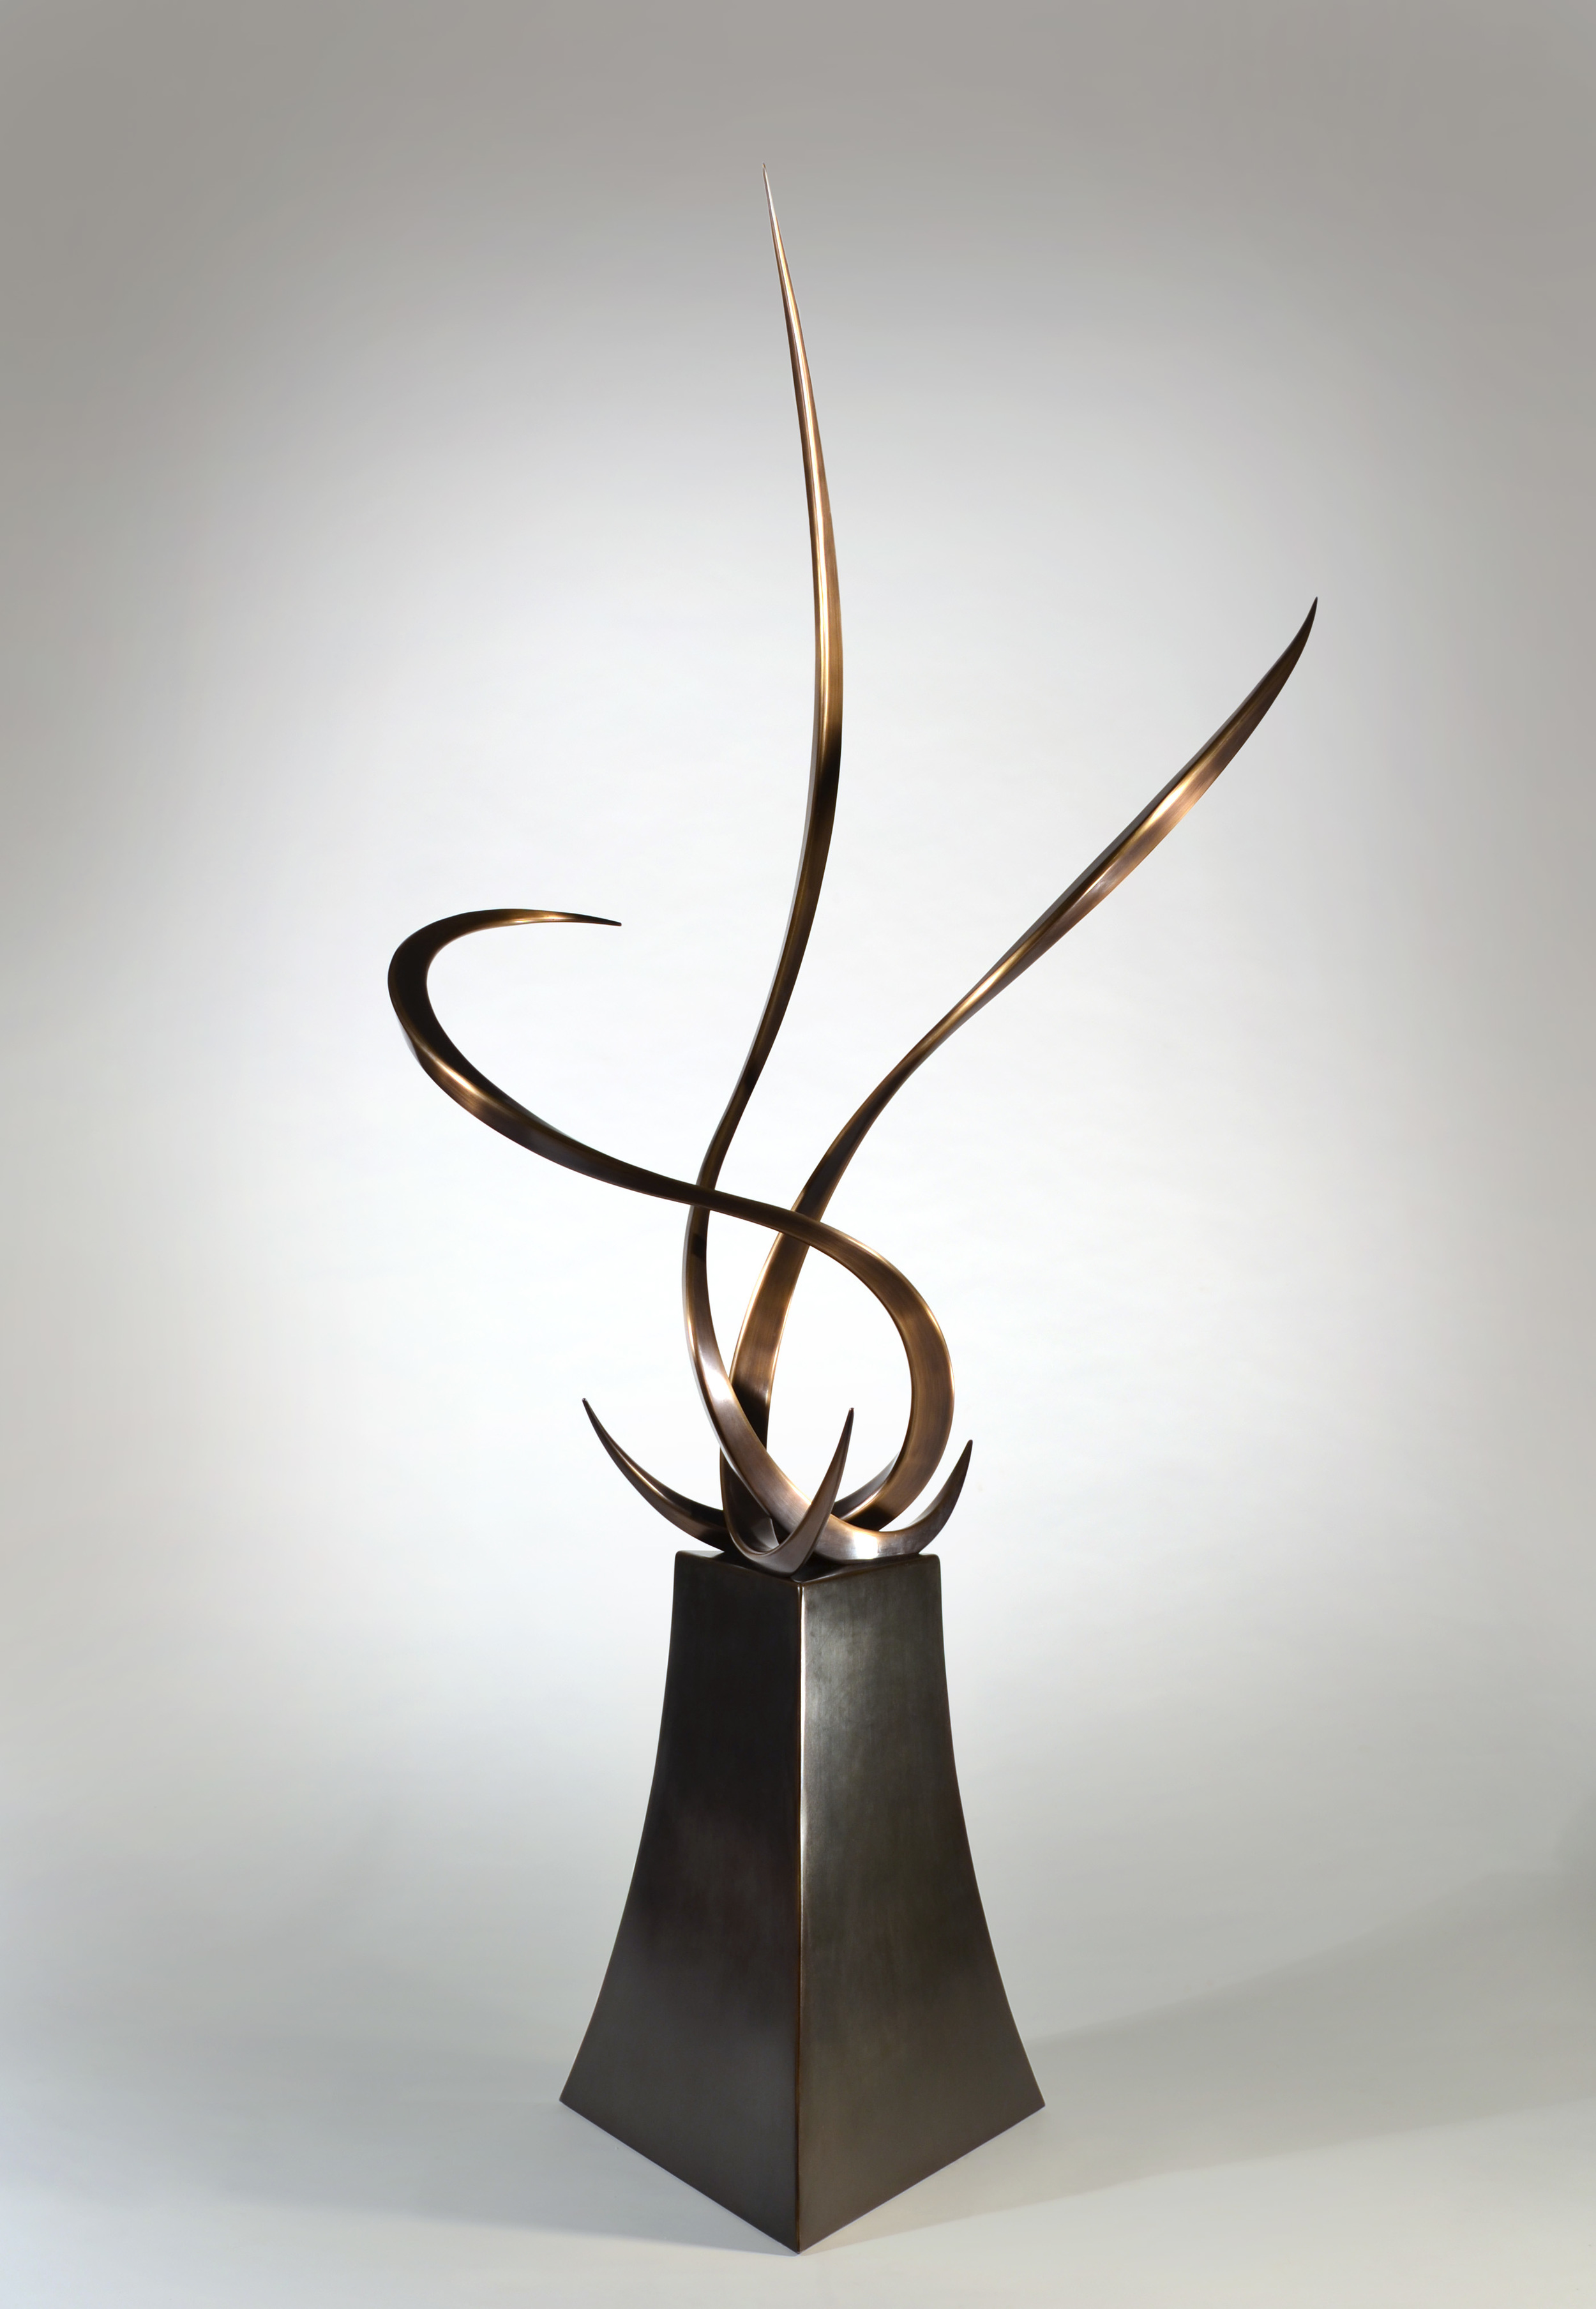 Untitled , Bronze &Steel, 7' x 3' x 3', 2013